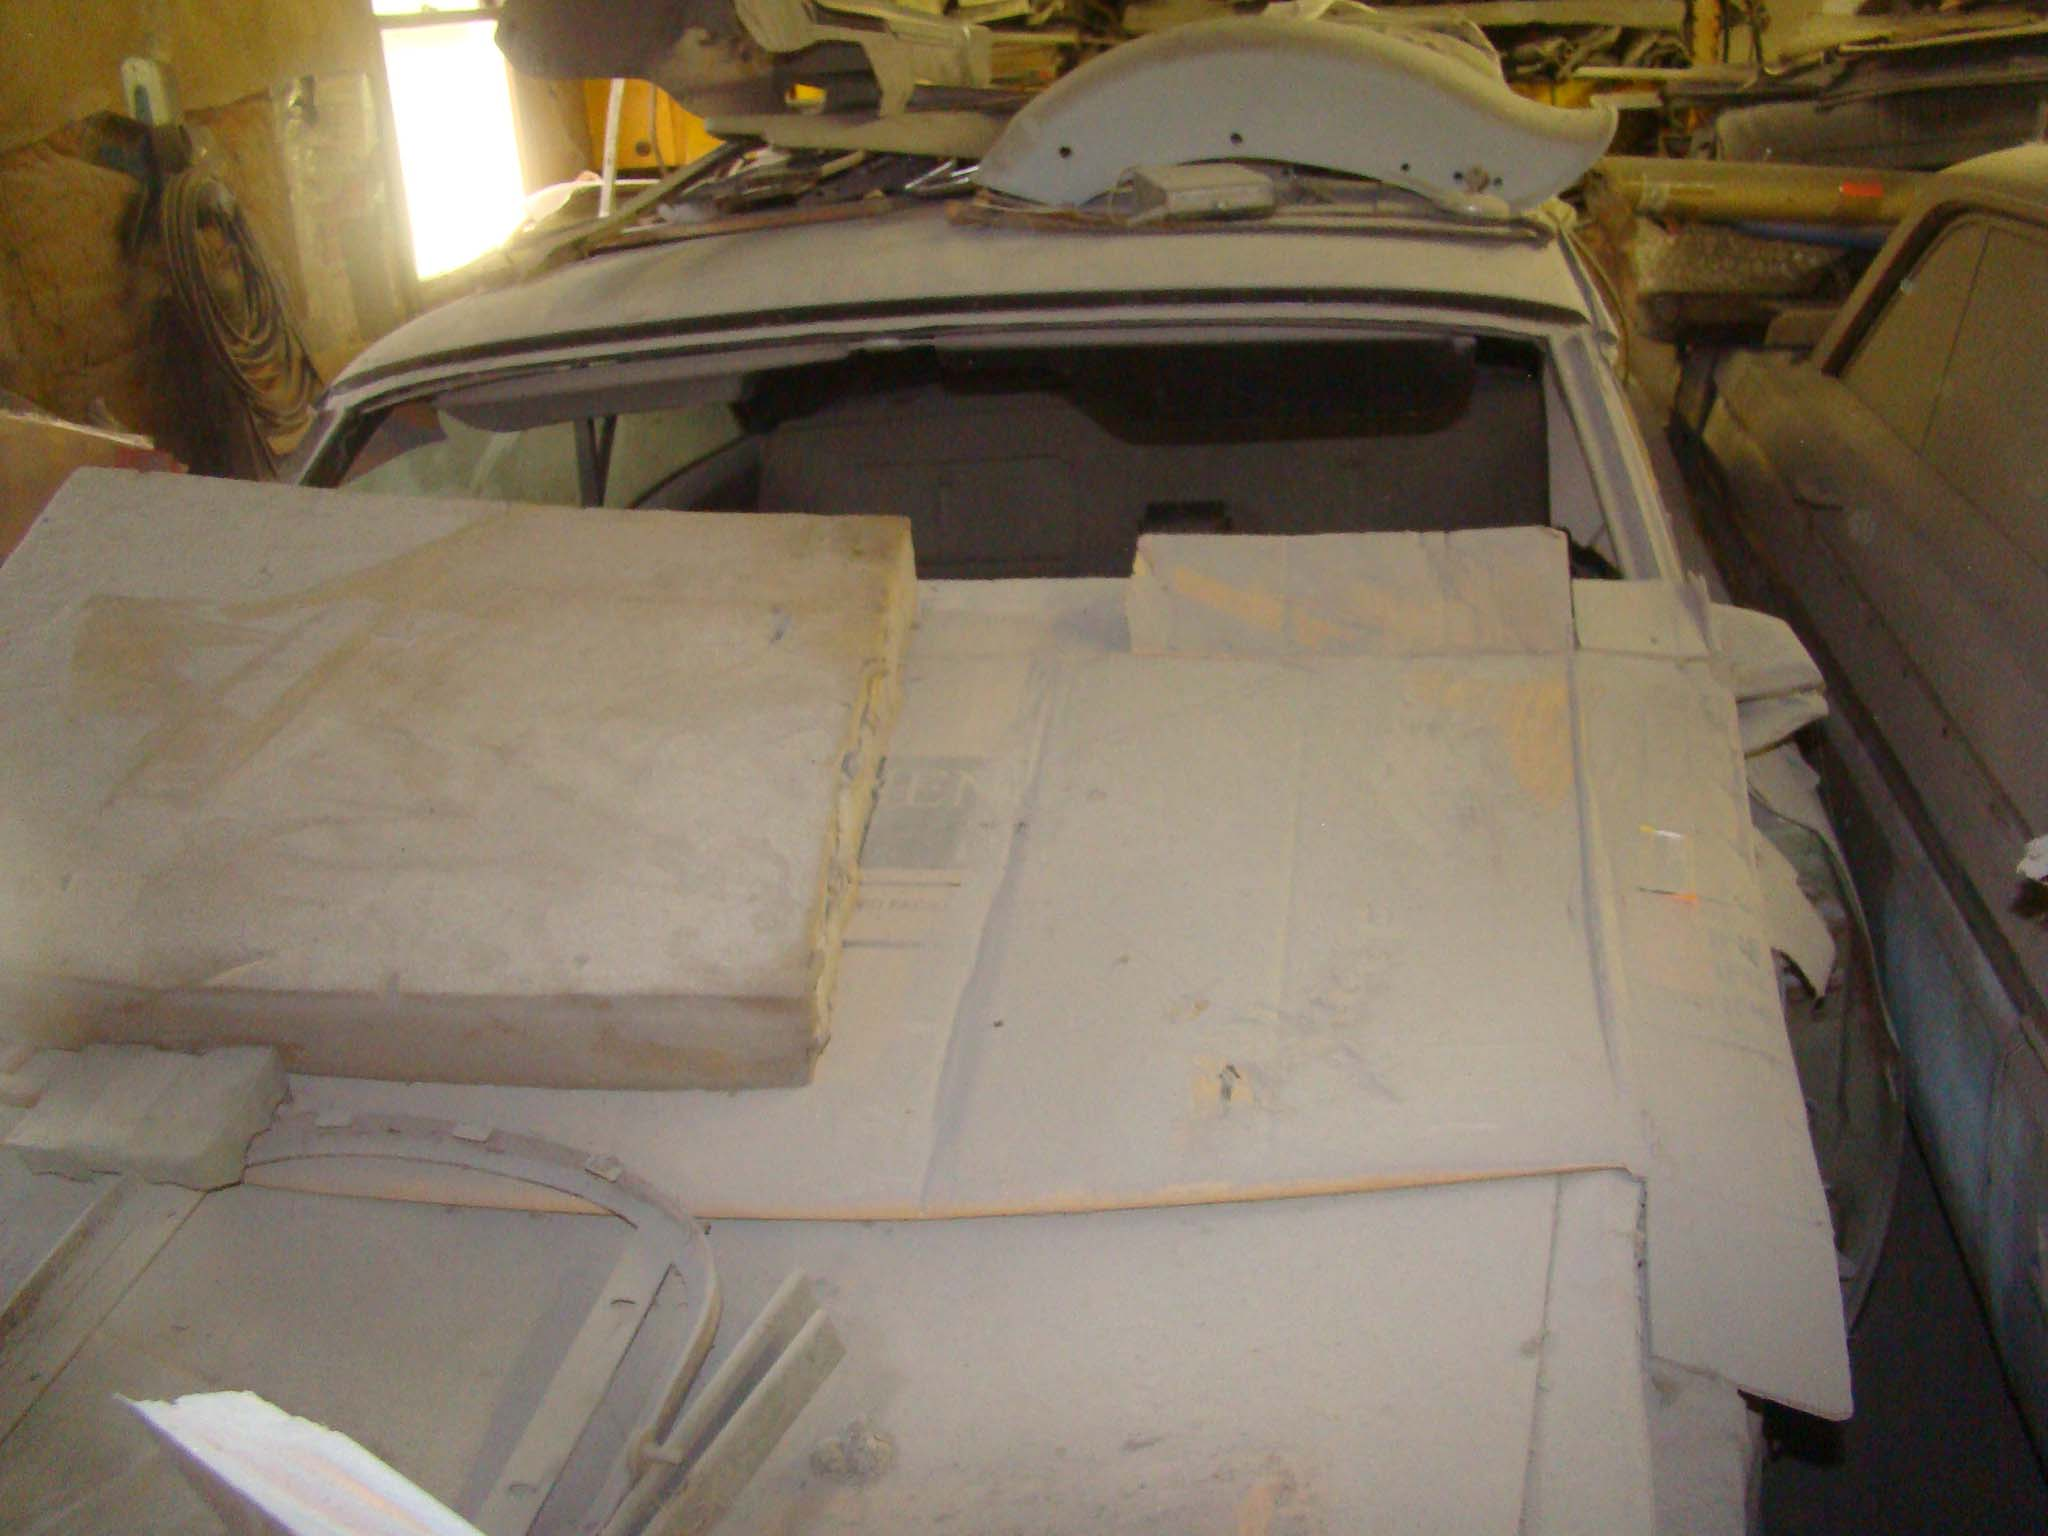 006 Cushman 1967 427 Ford Fairlane Buried